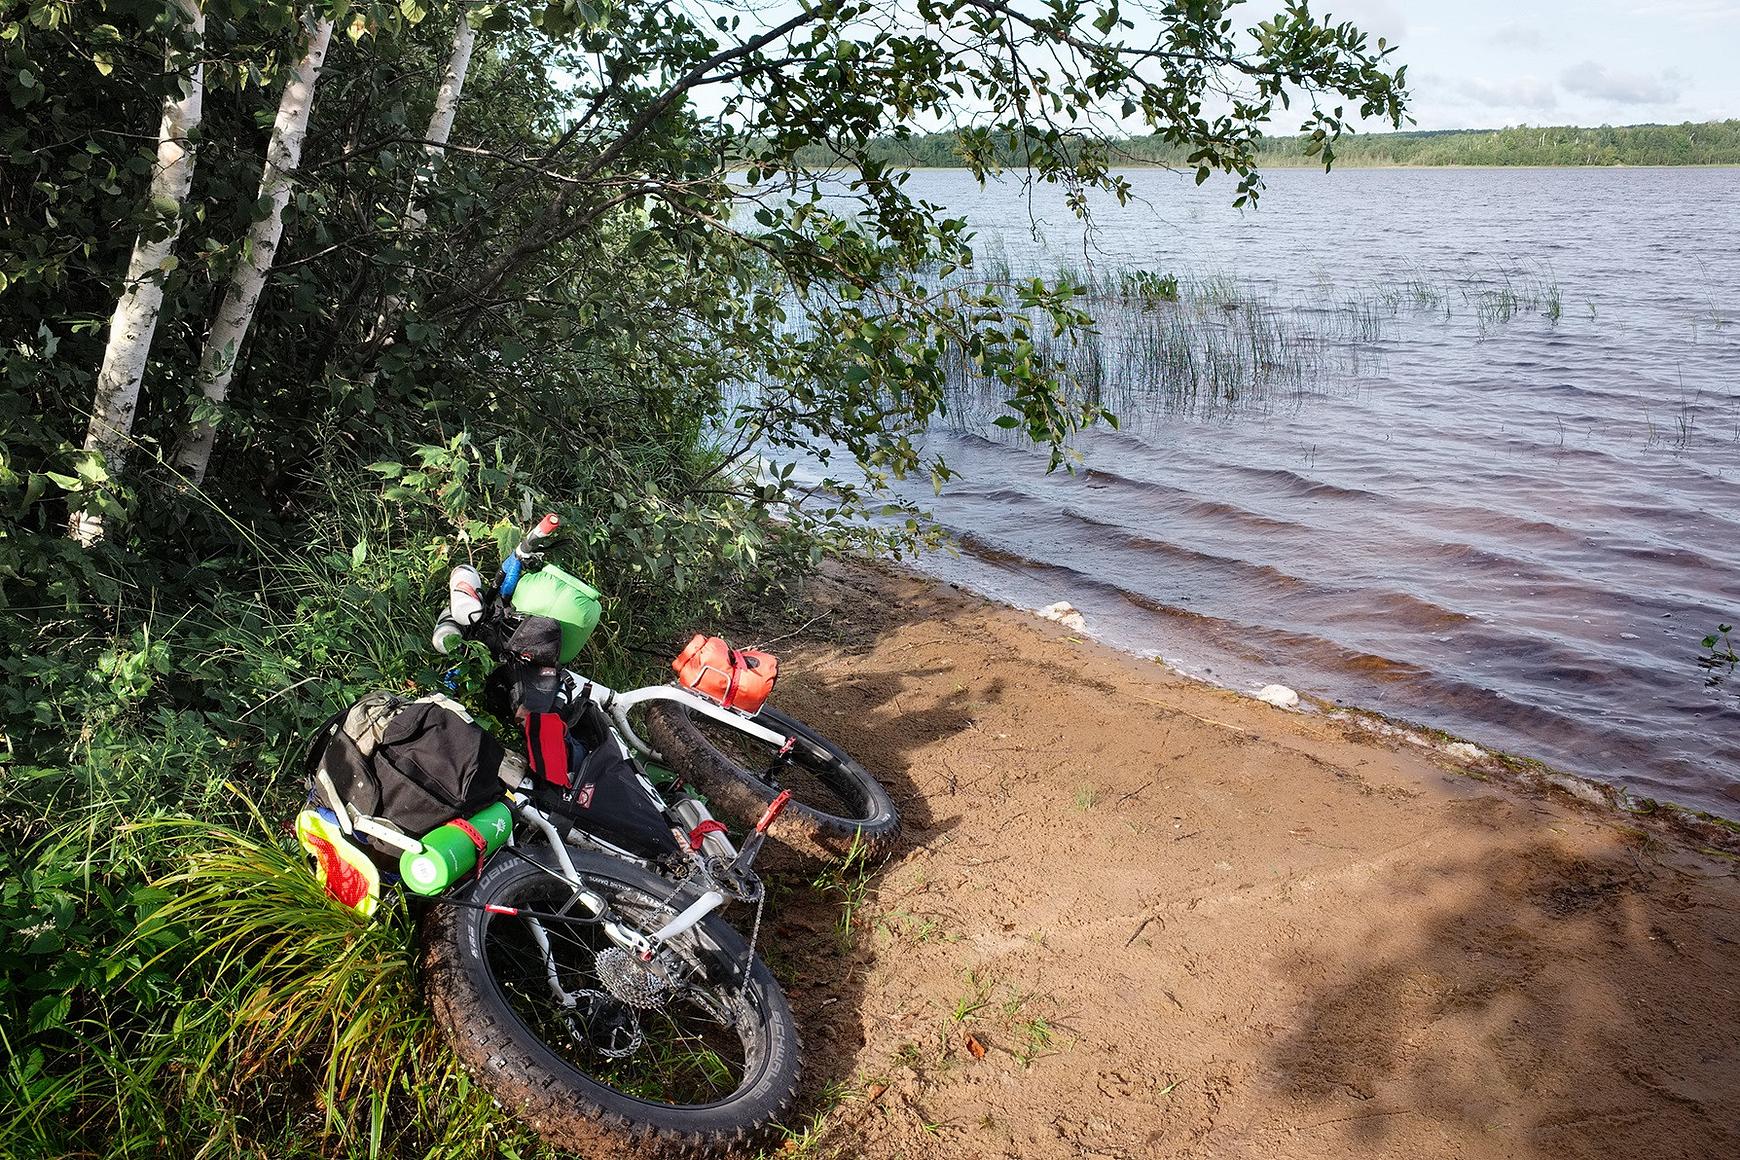 A fat-tire bike laying near the shore of a lake